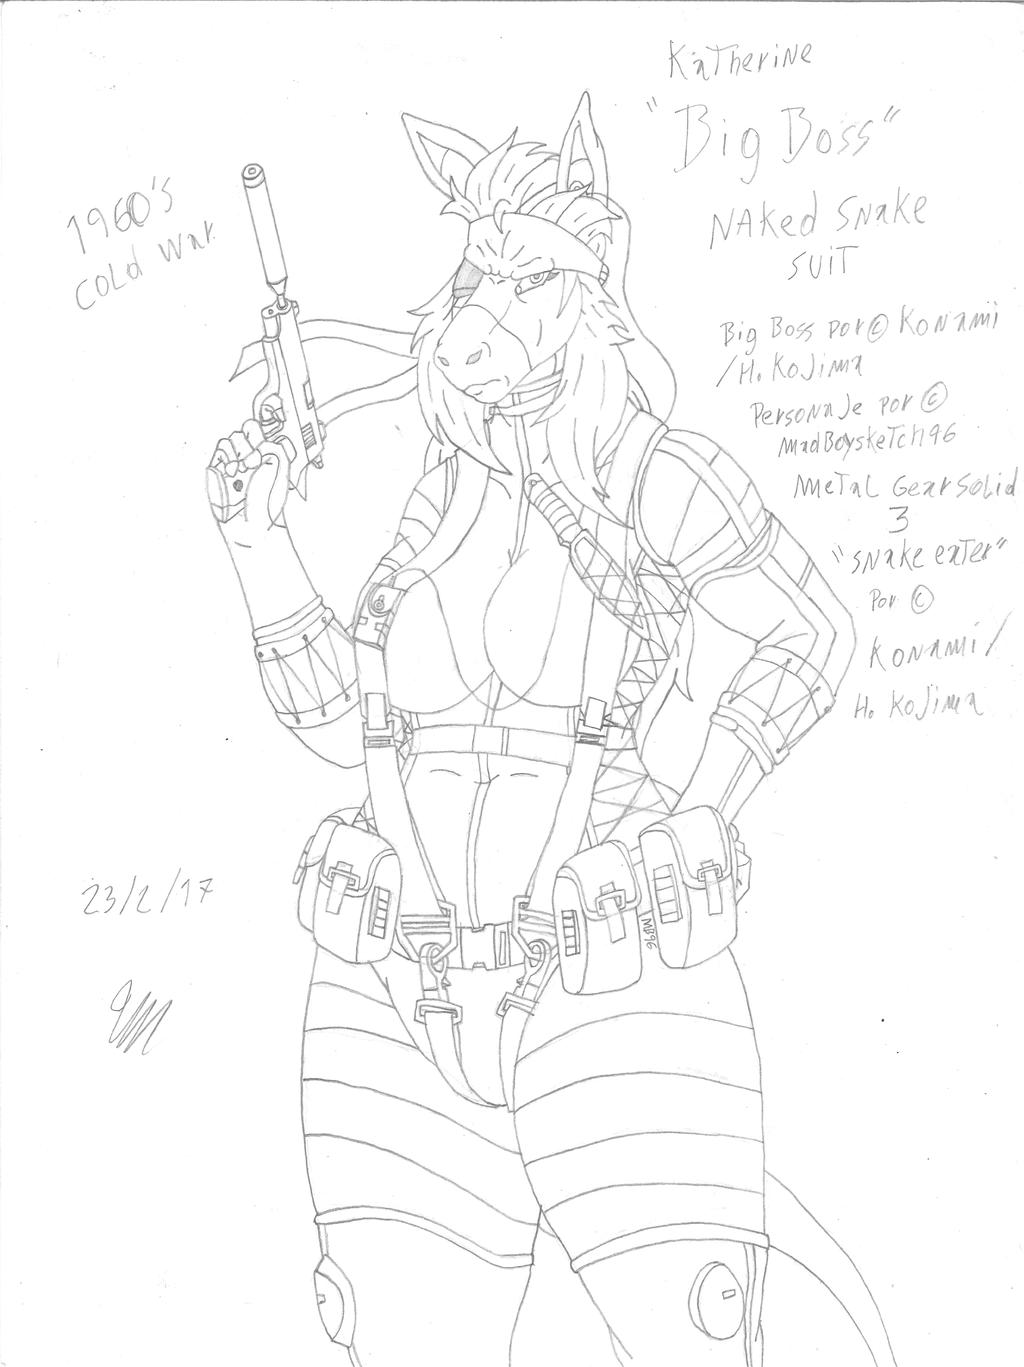 Big Boss Katherine - Original sketch